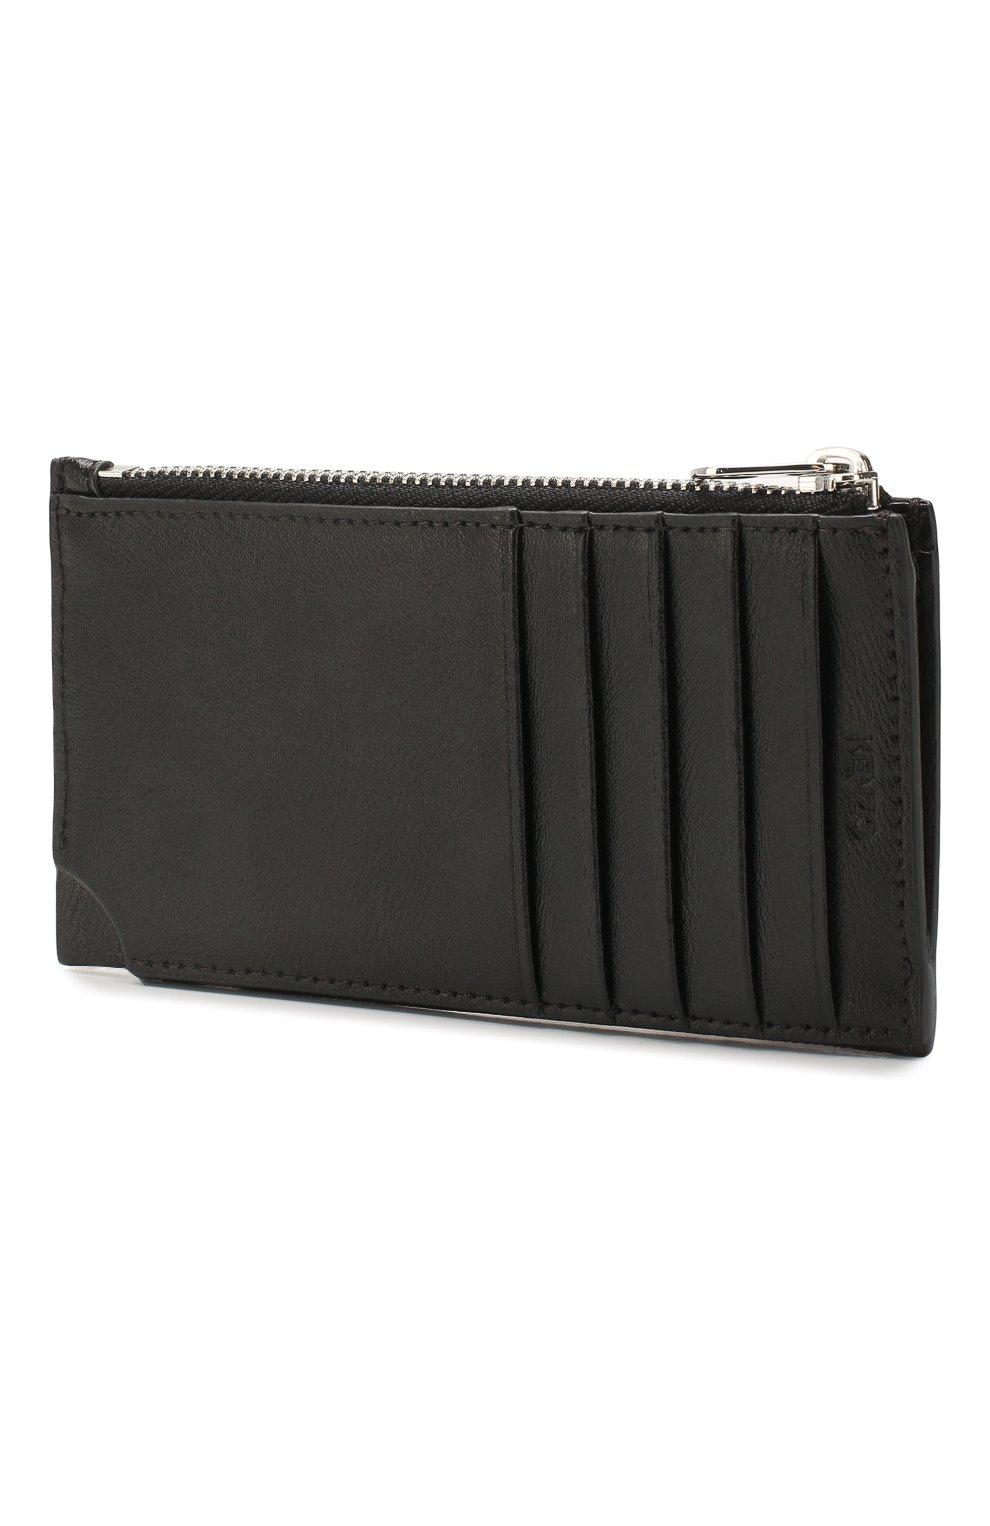 Женский кожаный футляр для кредитных карт KENZO черного цвета, арт. FA55PM706L37   Фото 2